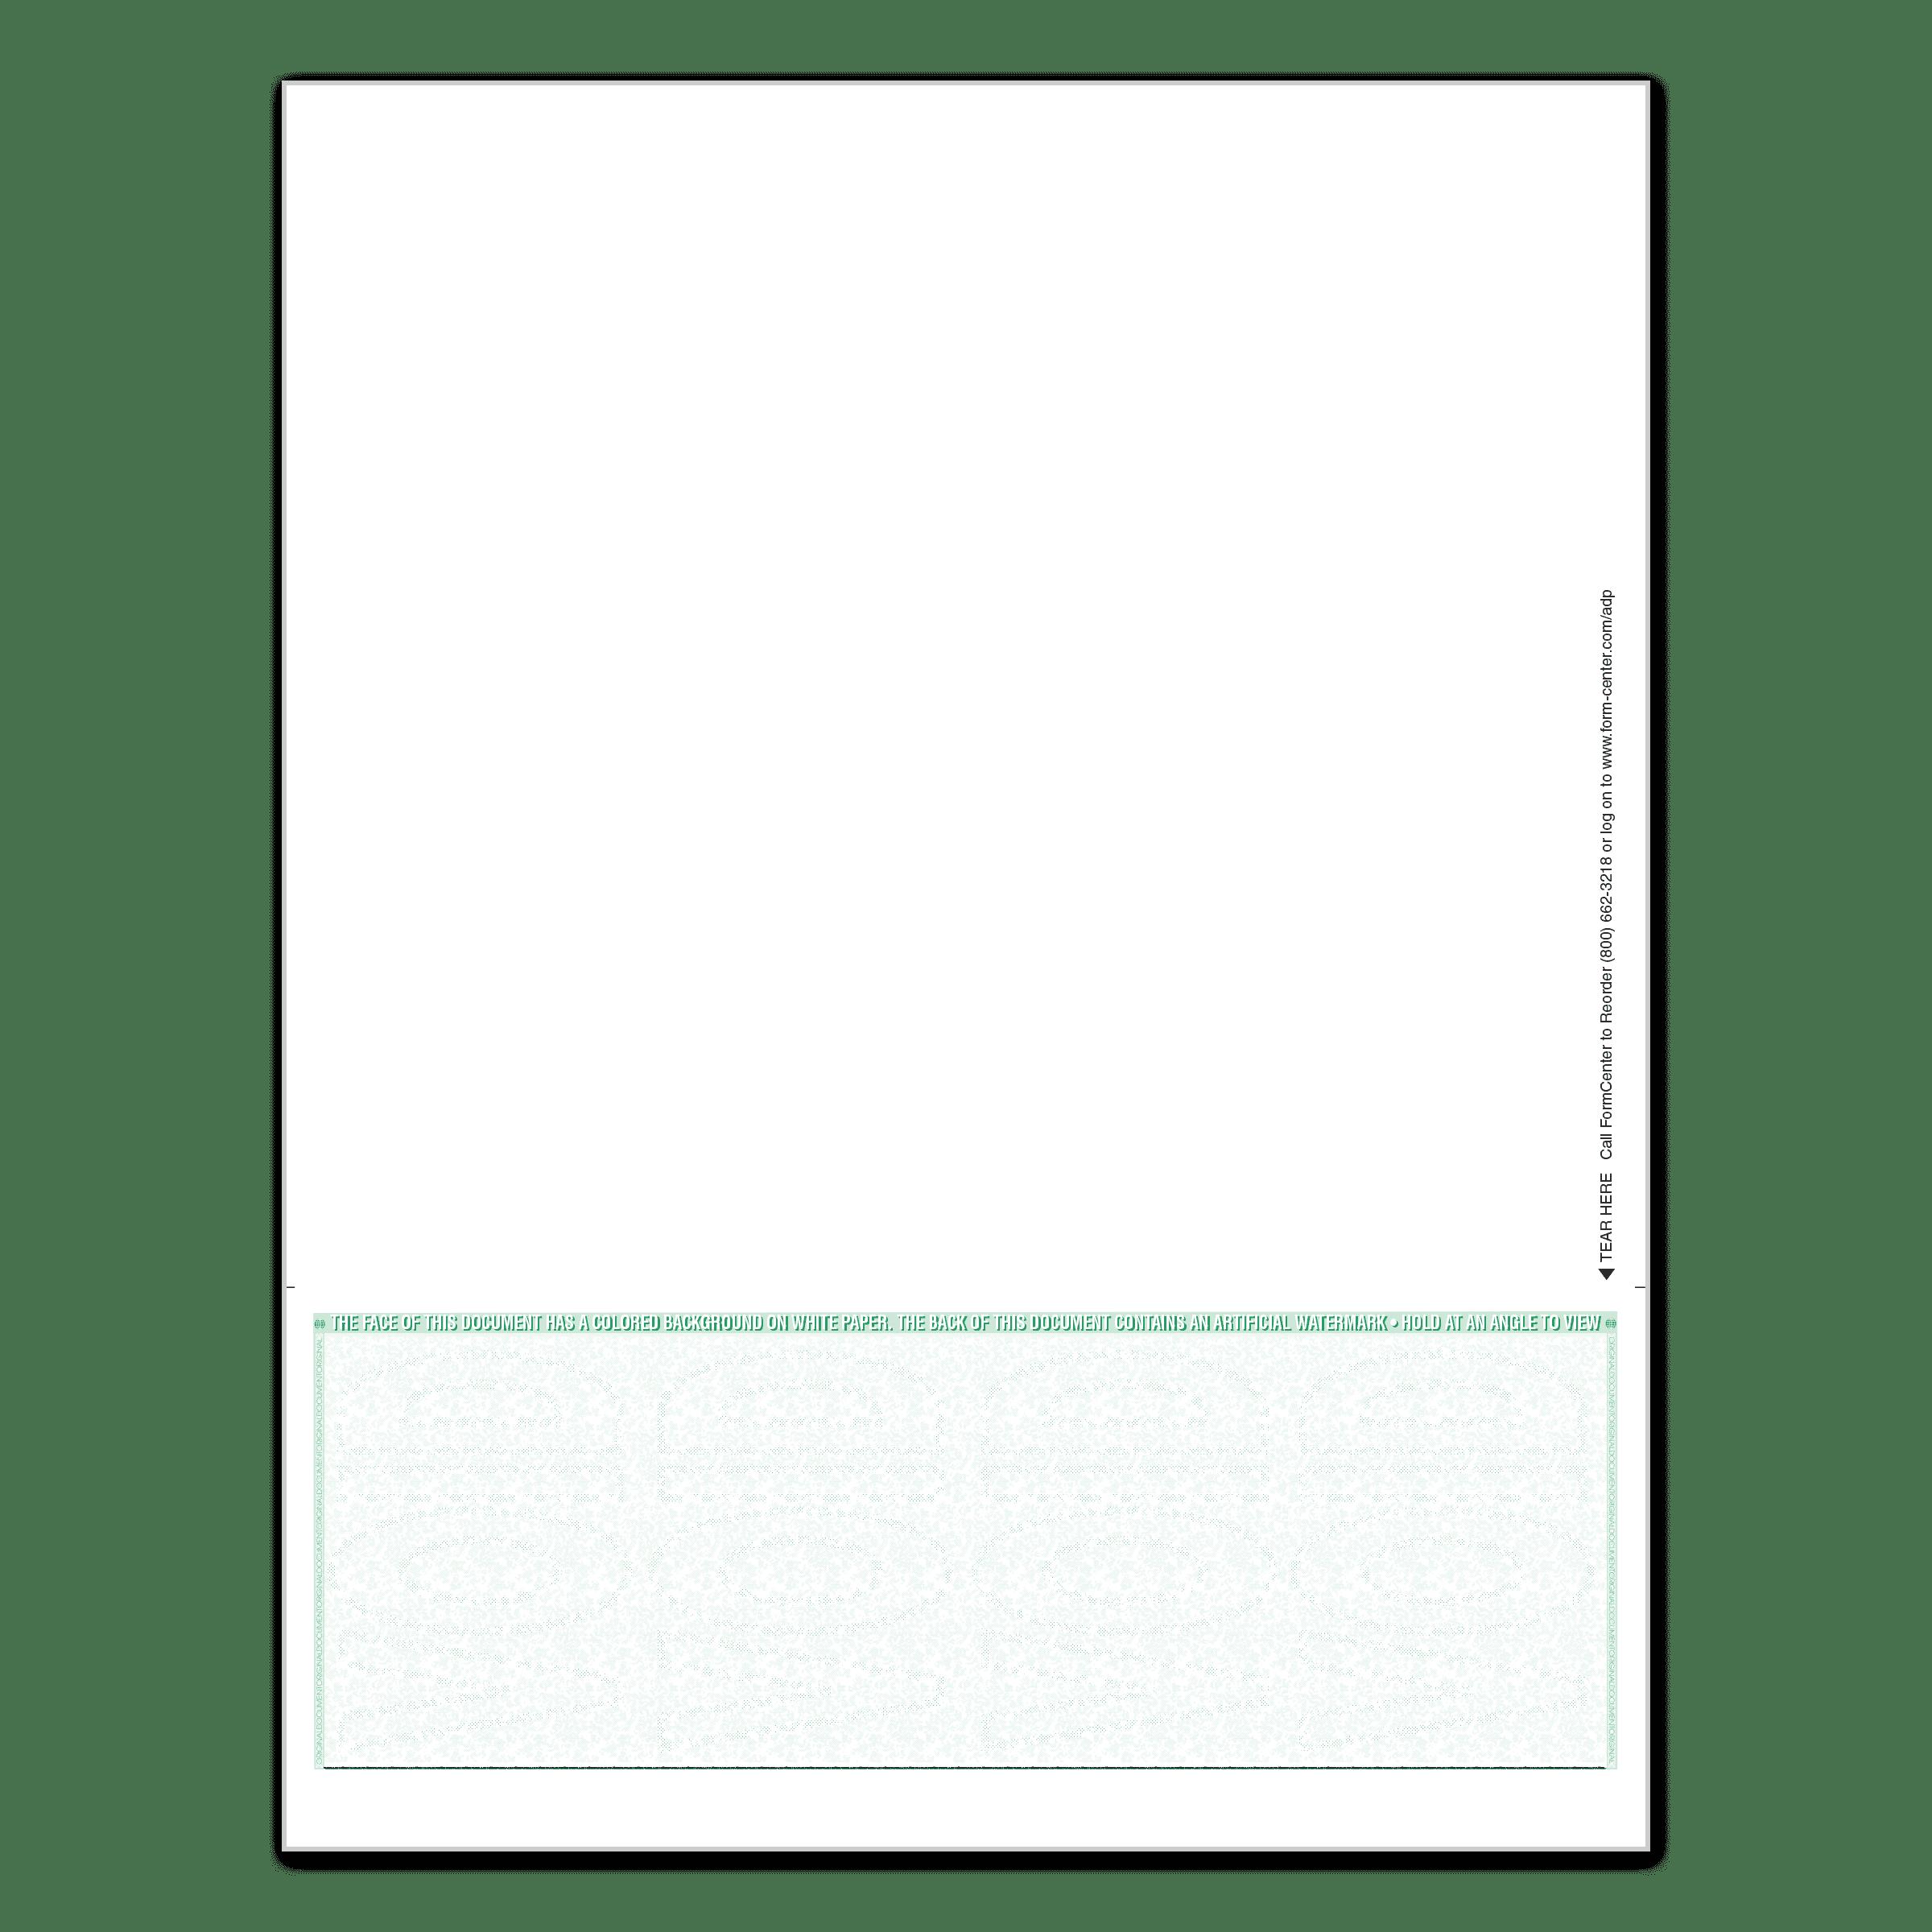 ADP RUN Blank MICR Checks